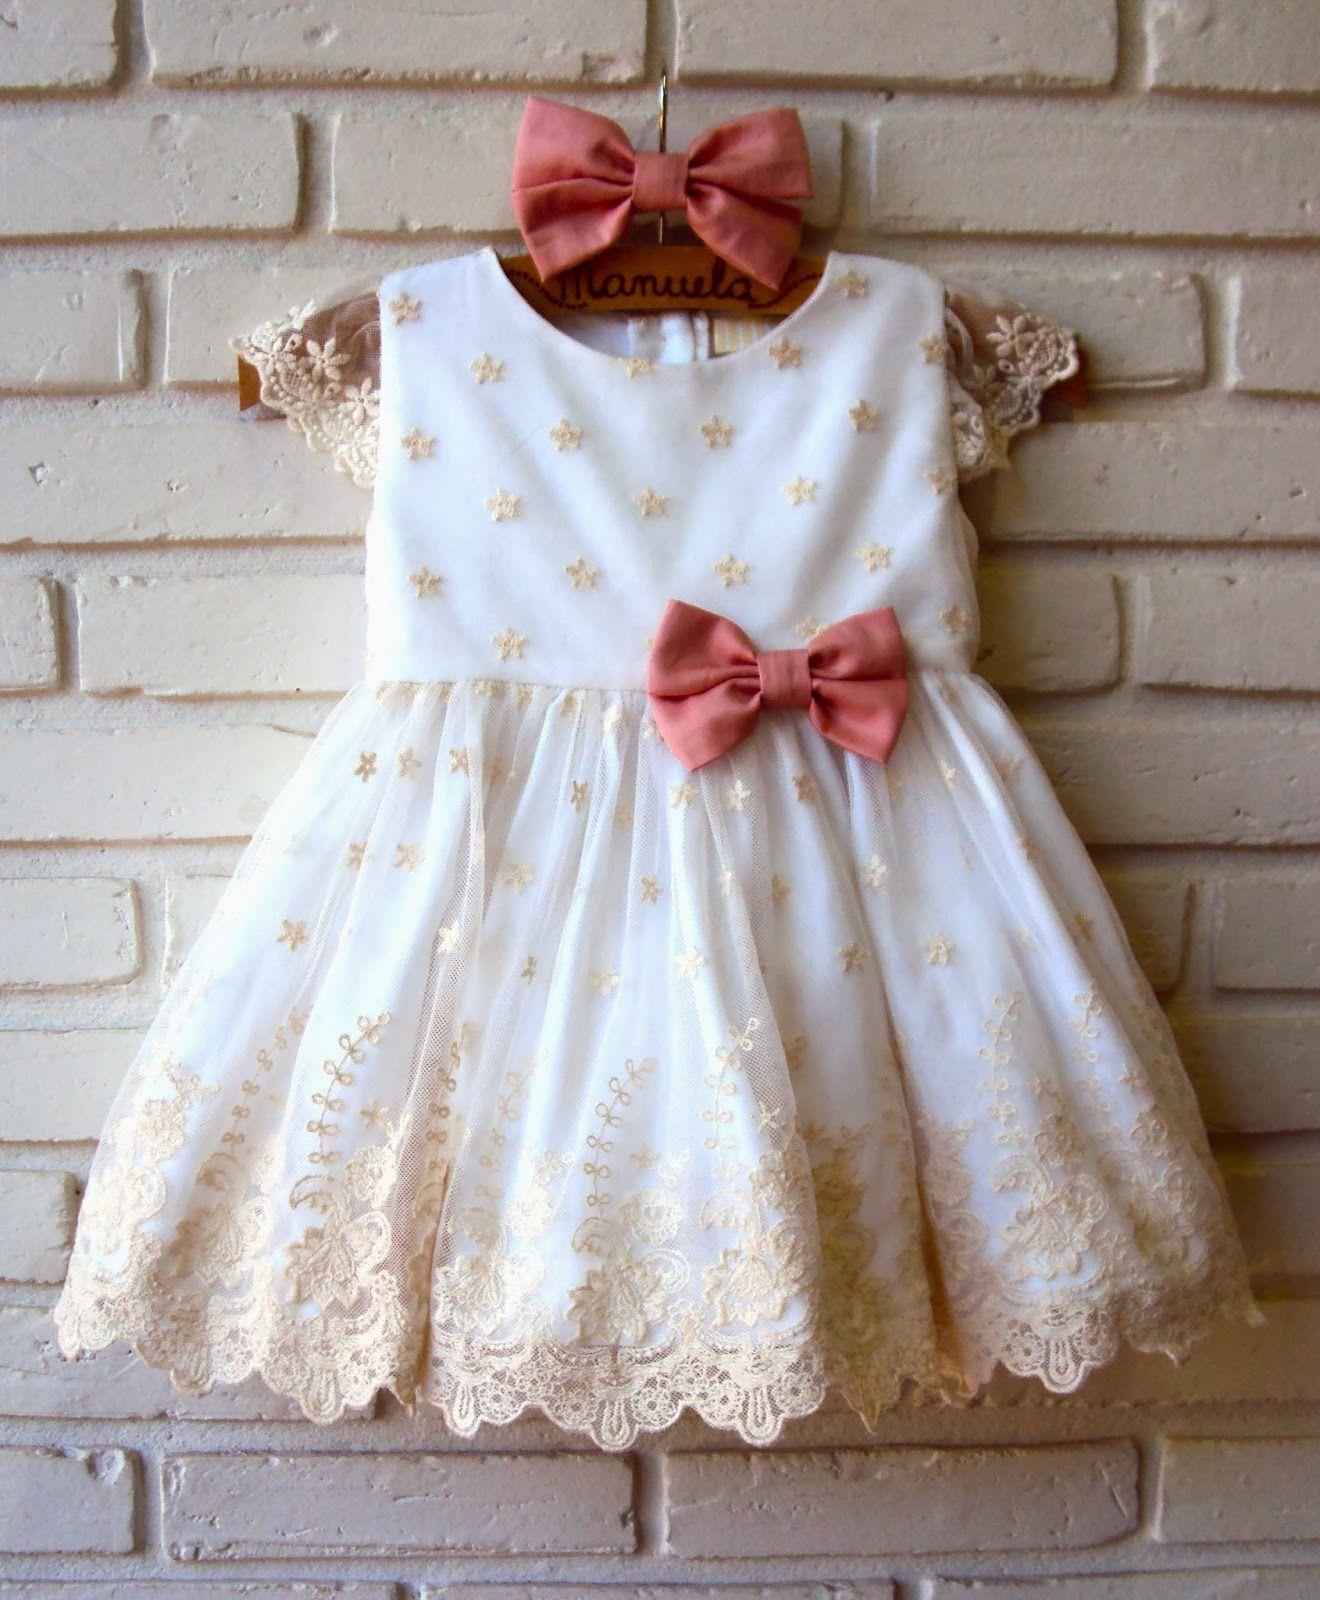 5697fde65f7 vestido infantil festa 1 ano - Pesquisa Google | niver 1 ano ...